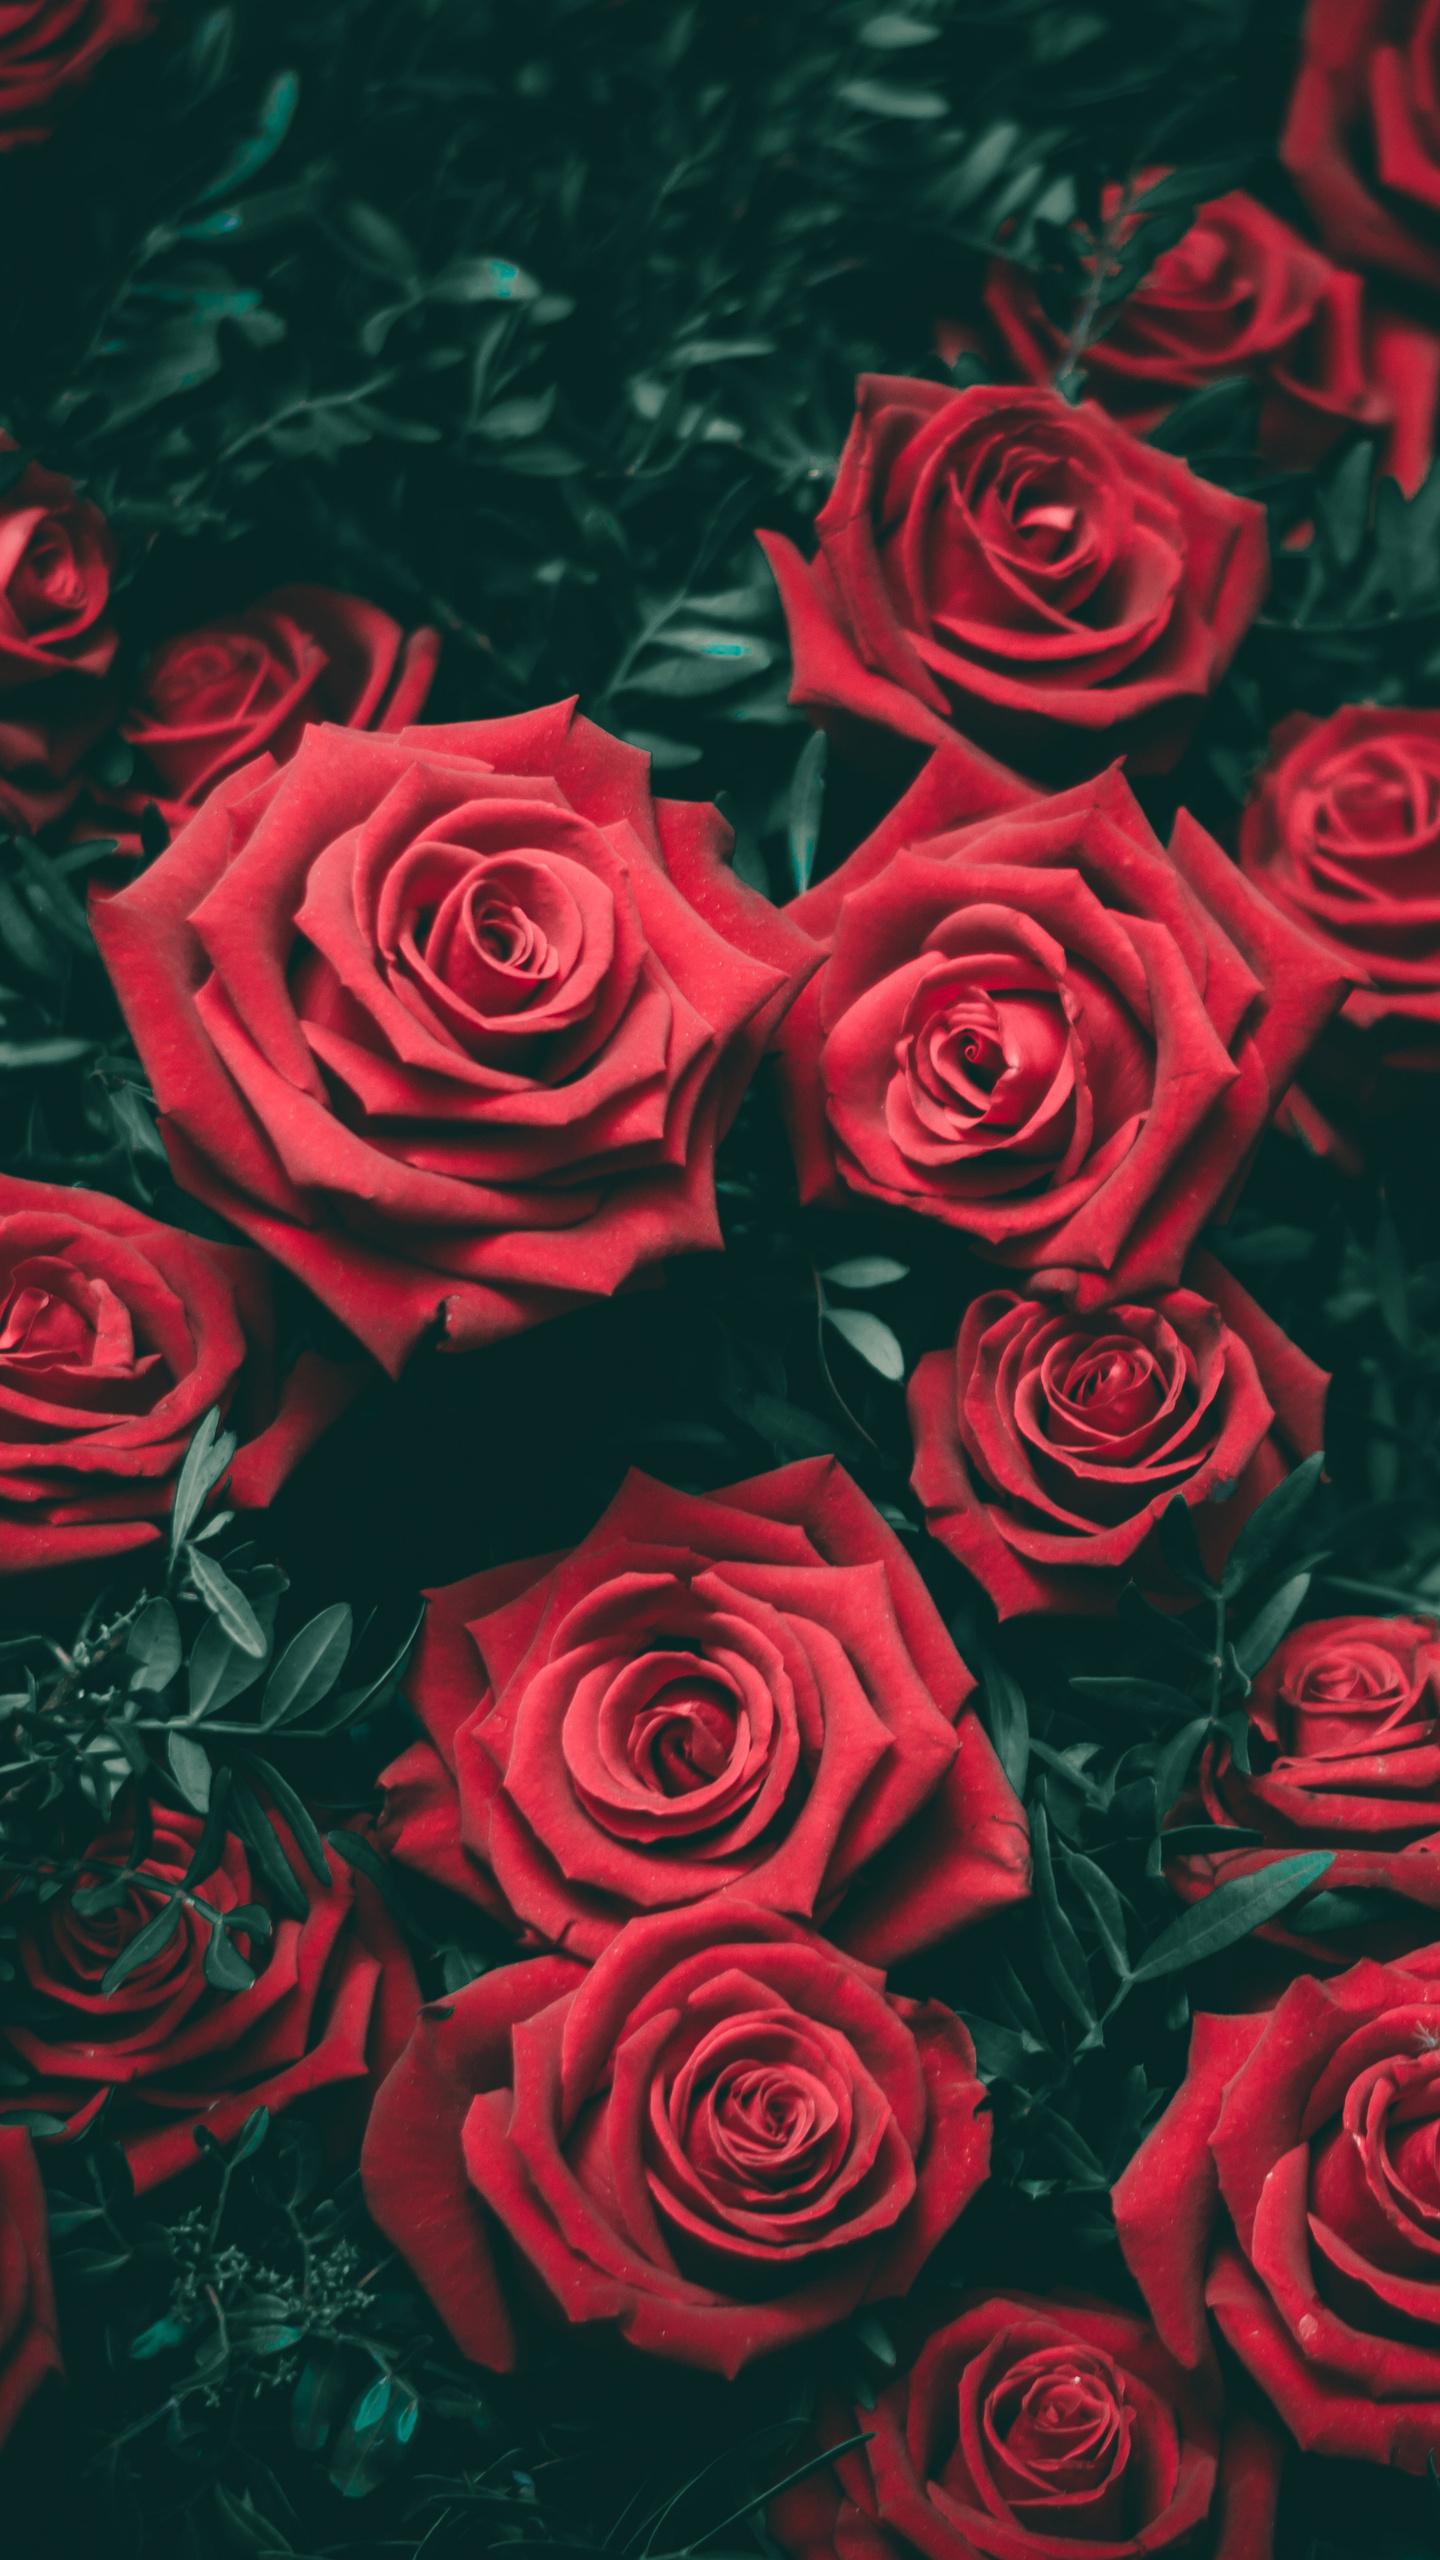 rose-5k-8n.jpg